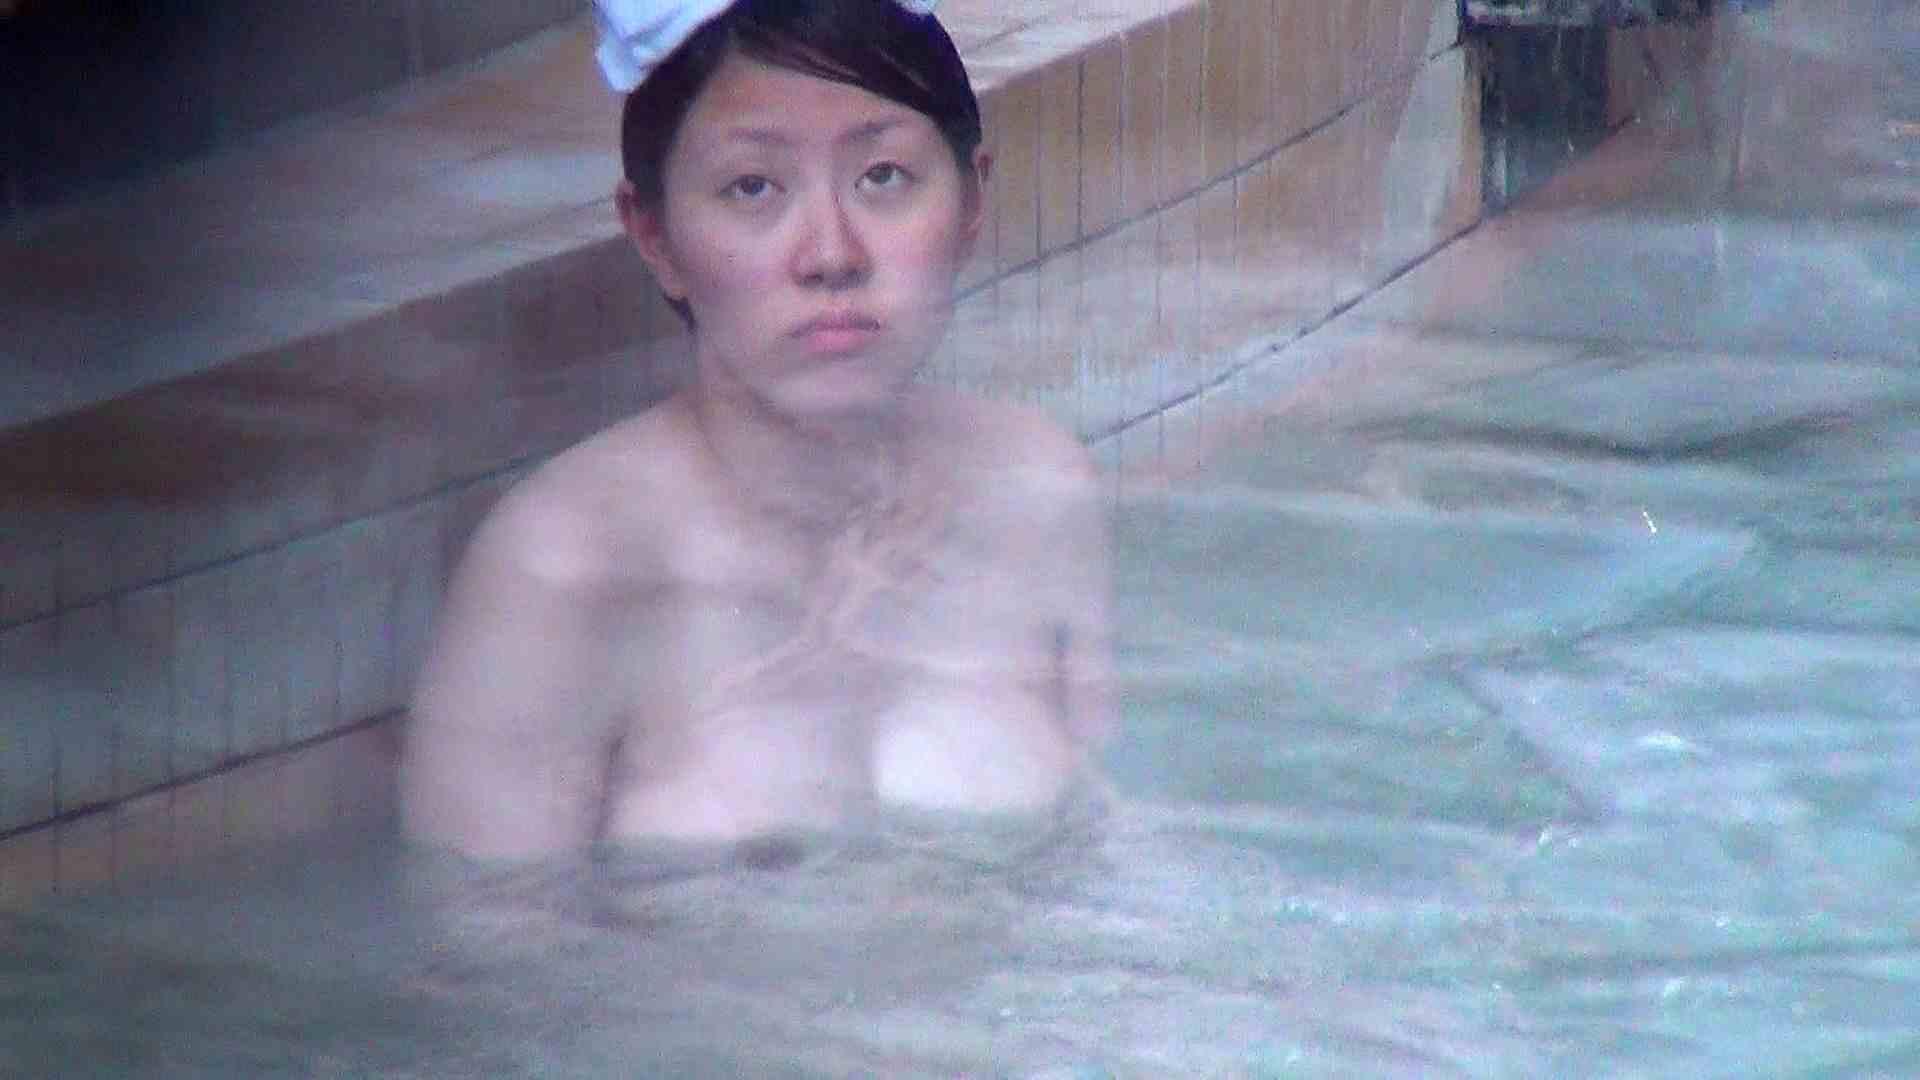 Aquaな露天風呂Vol.289 盗撮師作品 SEX無修正画像 71pic 17